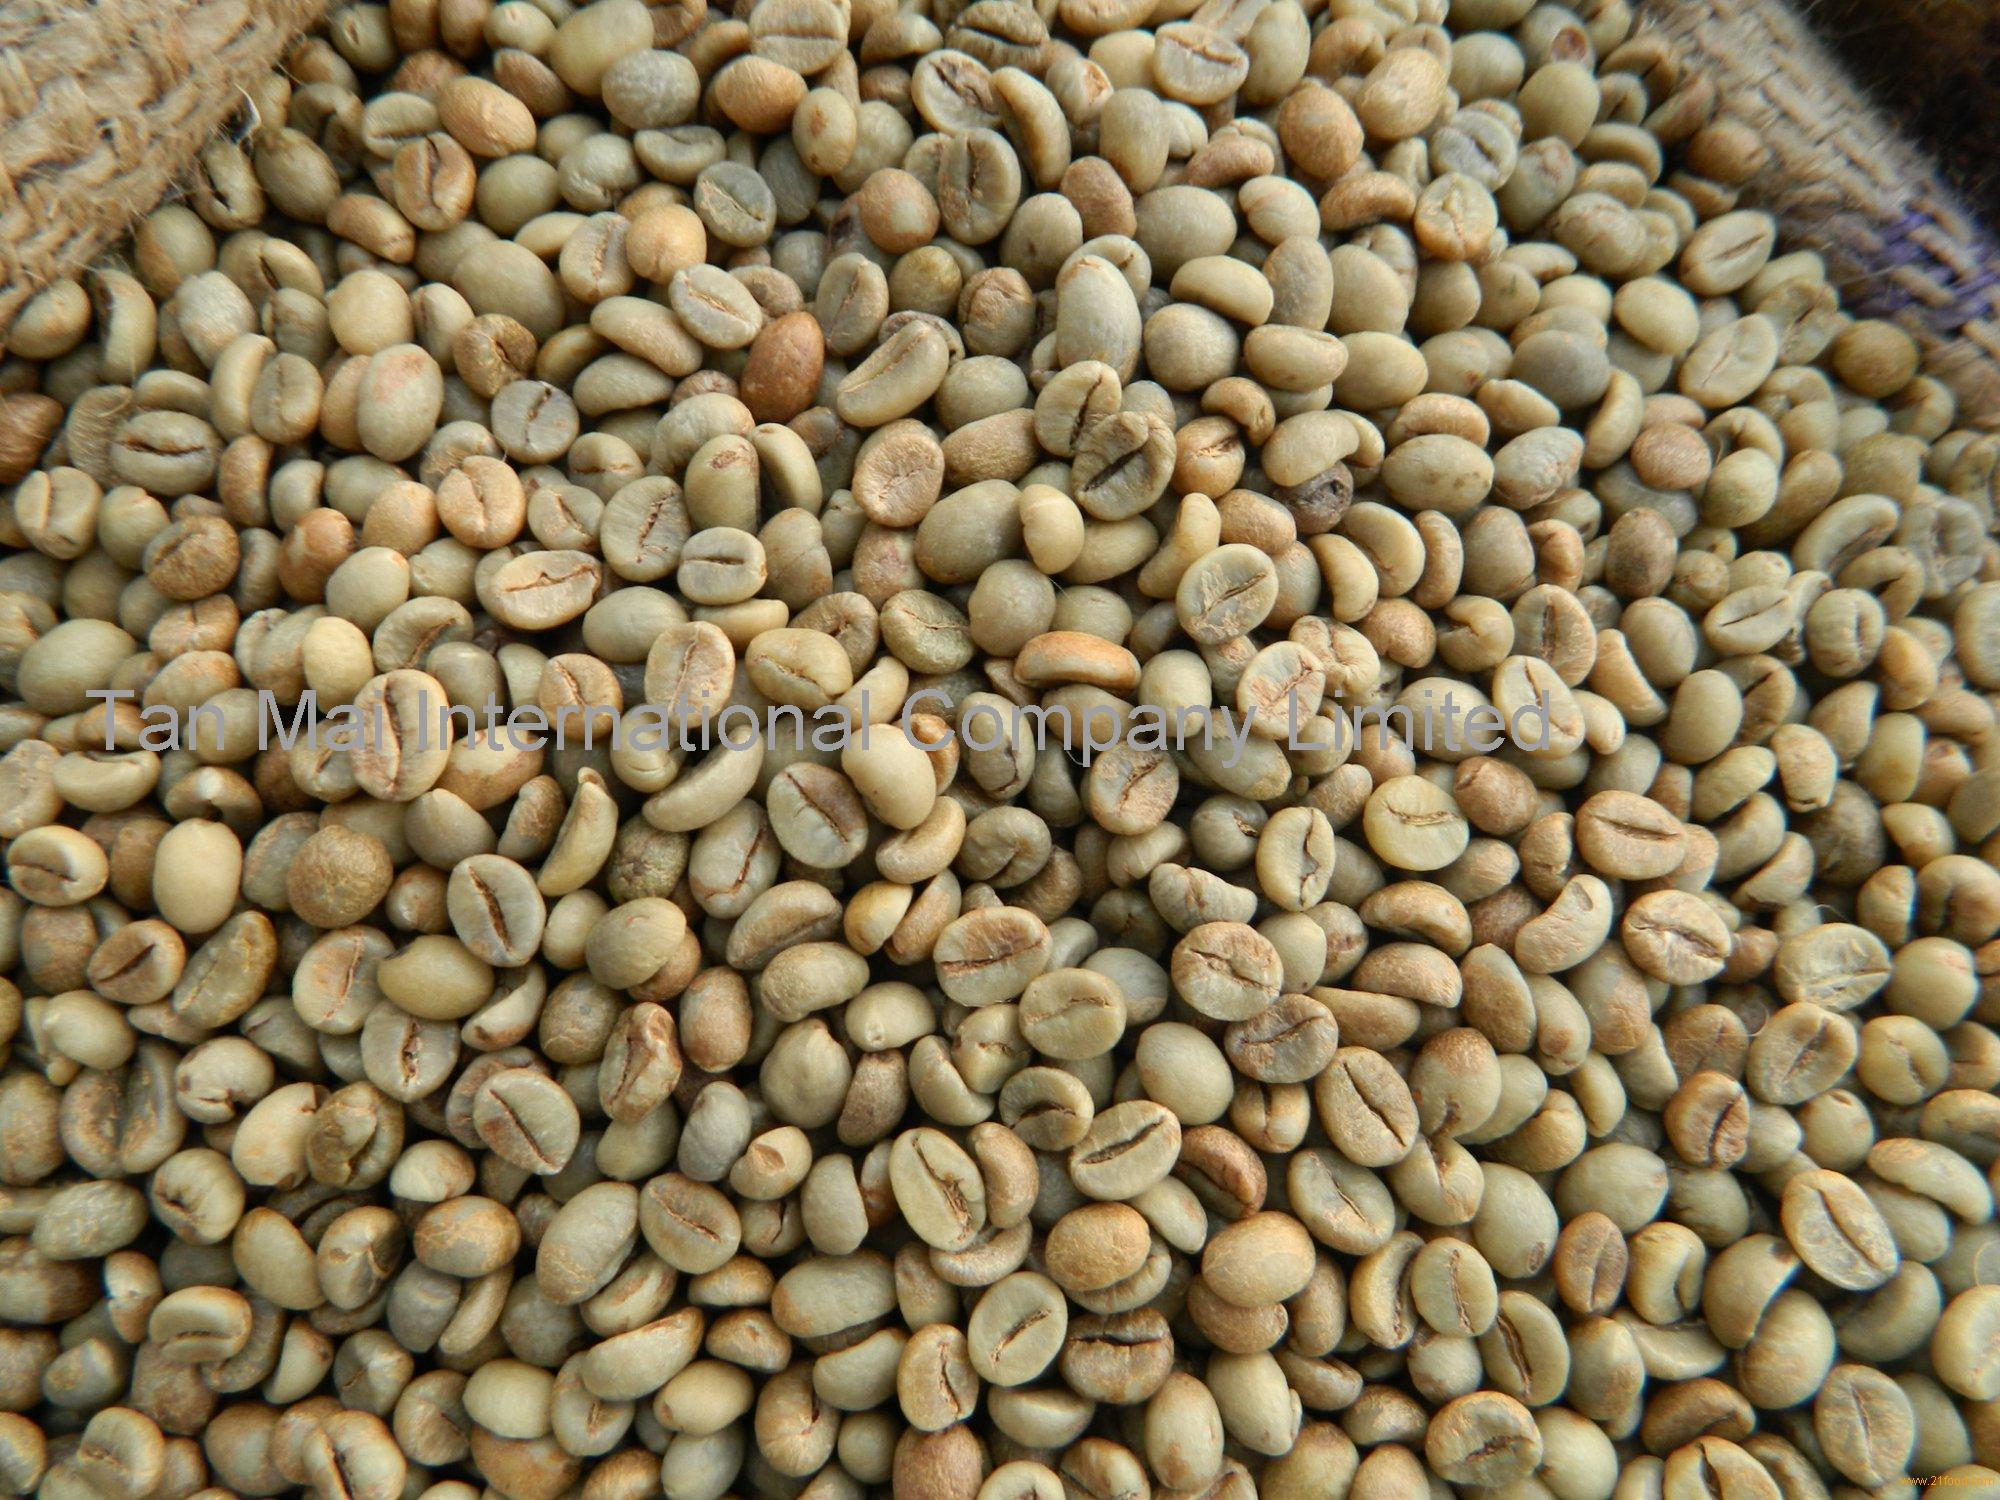 Vietnam robusta green coffee beans products,Vietnam Vietnam robusta green coffee beans supplier2000 x 1500 jpeg 487kB